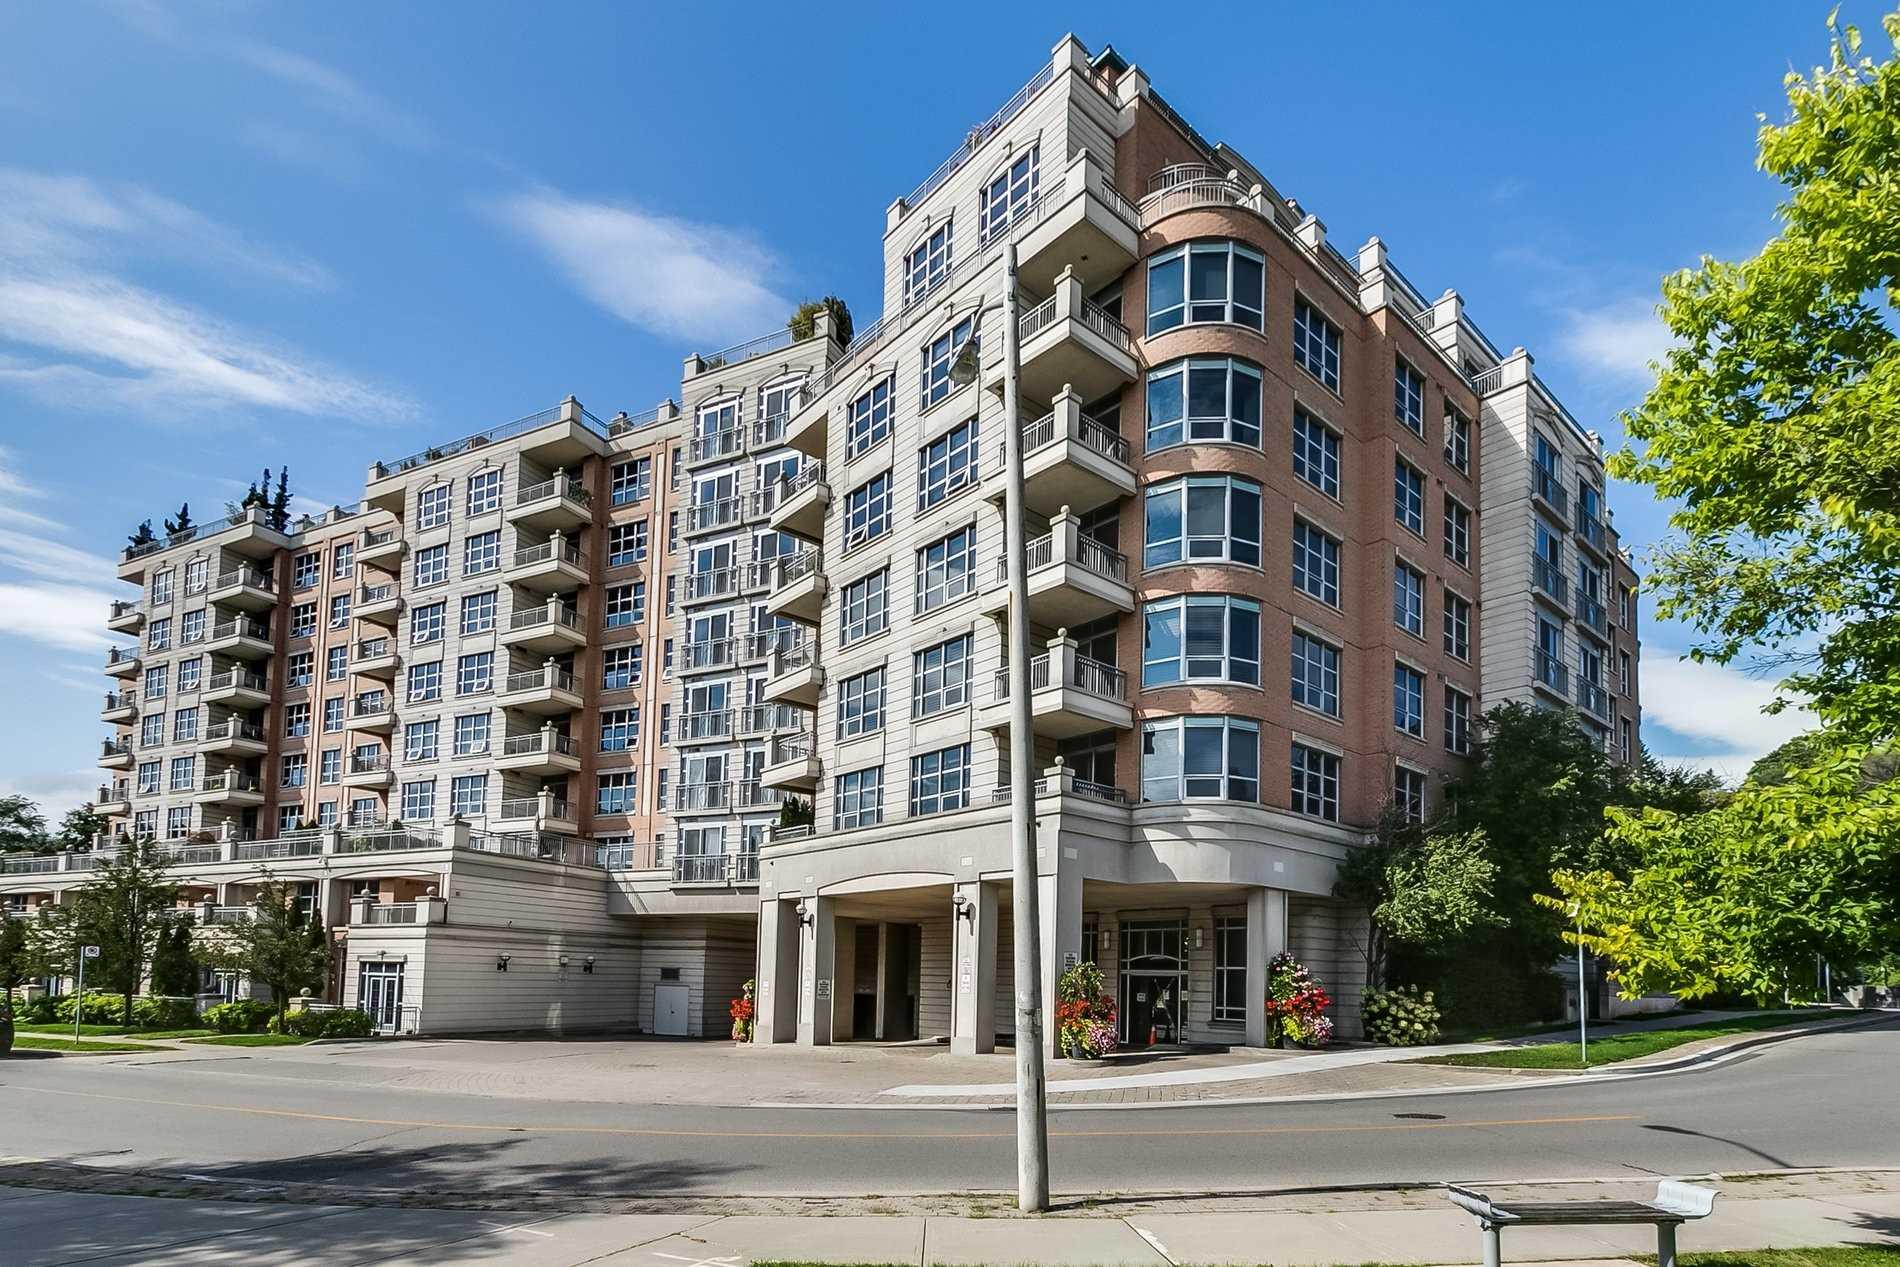 Condo Apt For Sale In Toronto , 2 Bedrooms Bedrooms, ,2 BathroomsBathrooms,Condo Apt,For Sale,310,Old York Mills